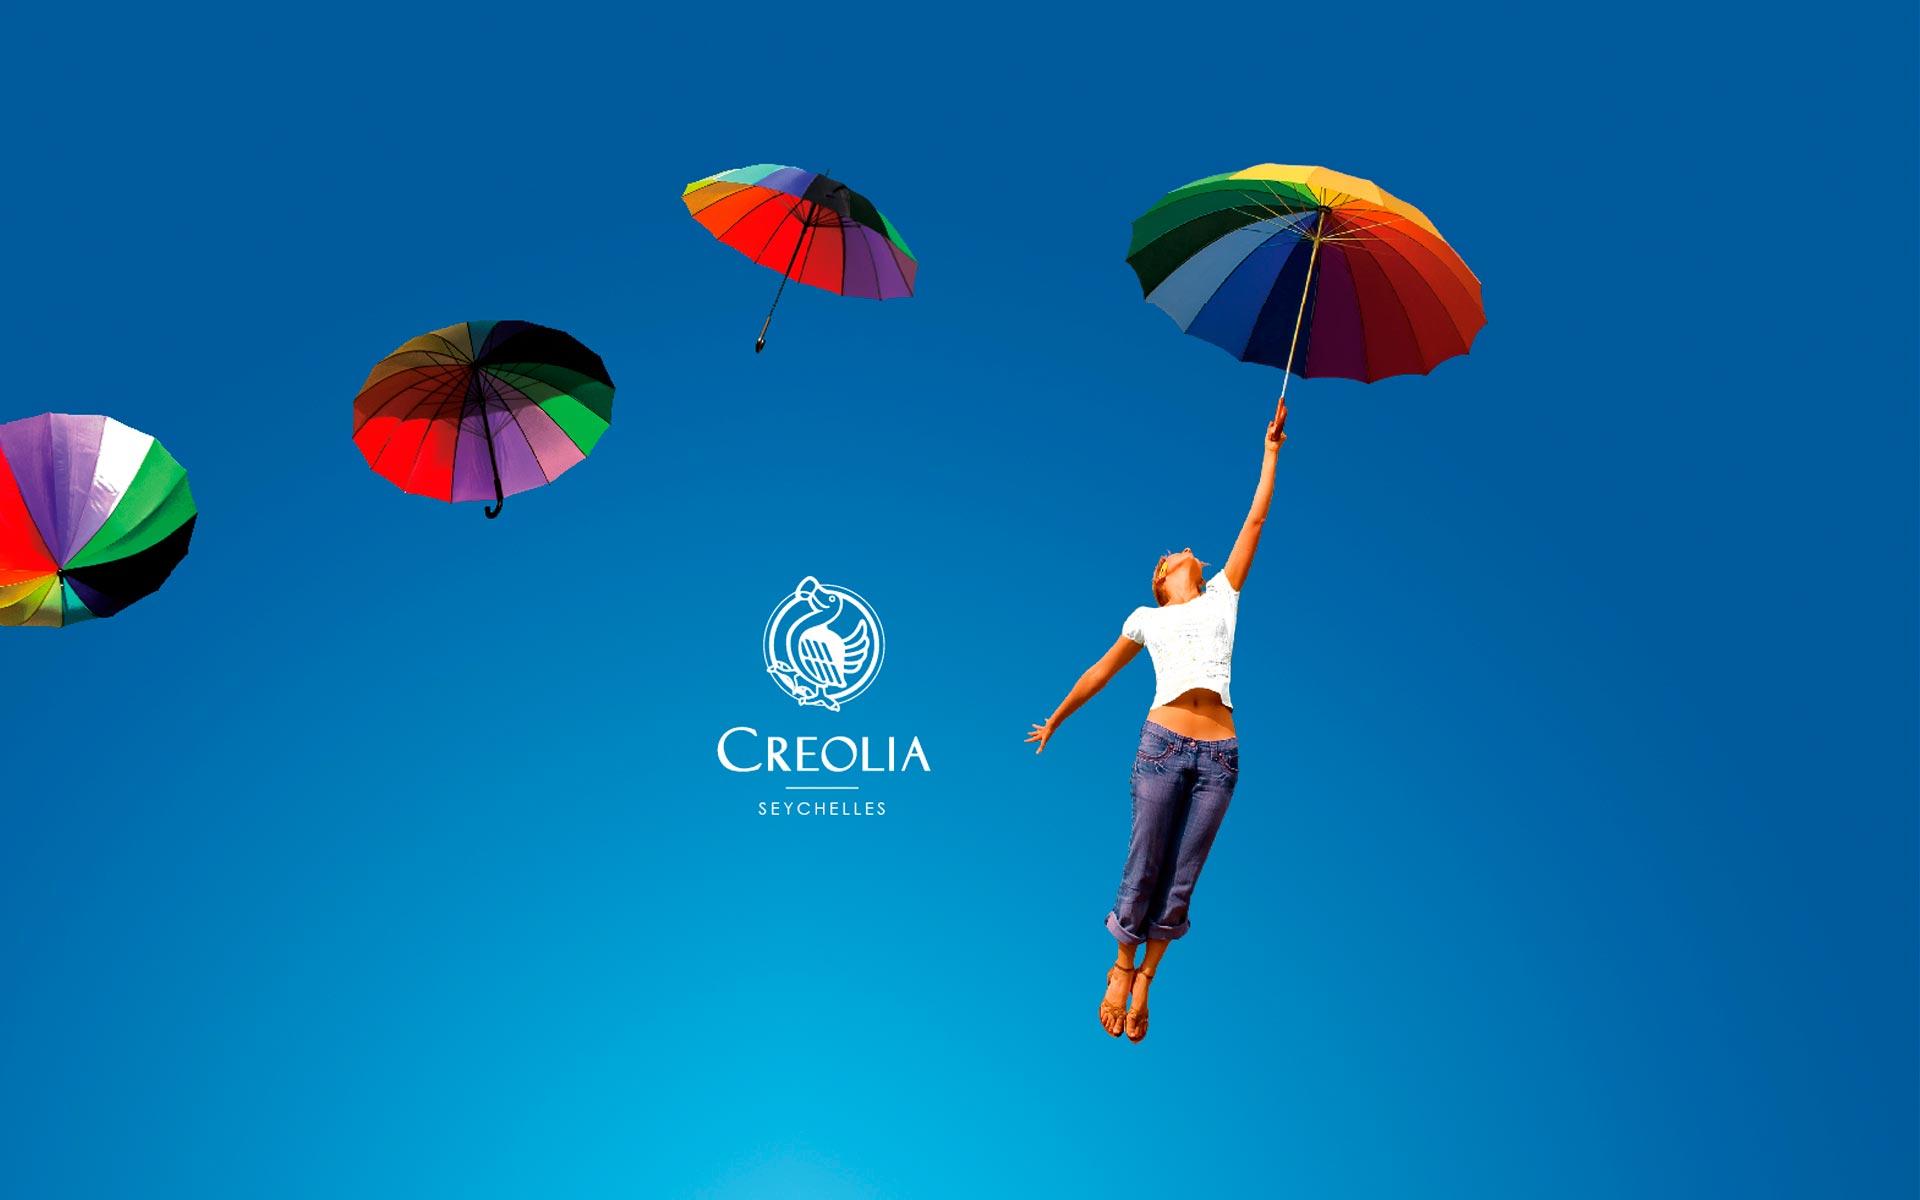 Creolia